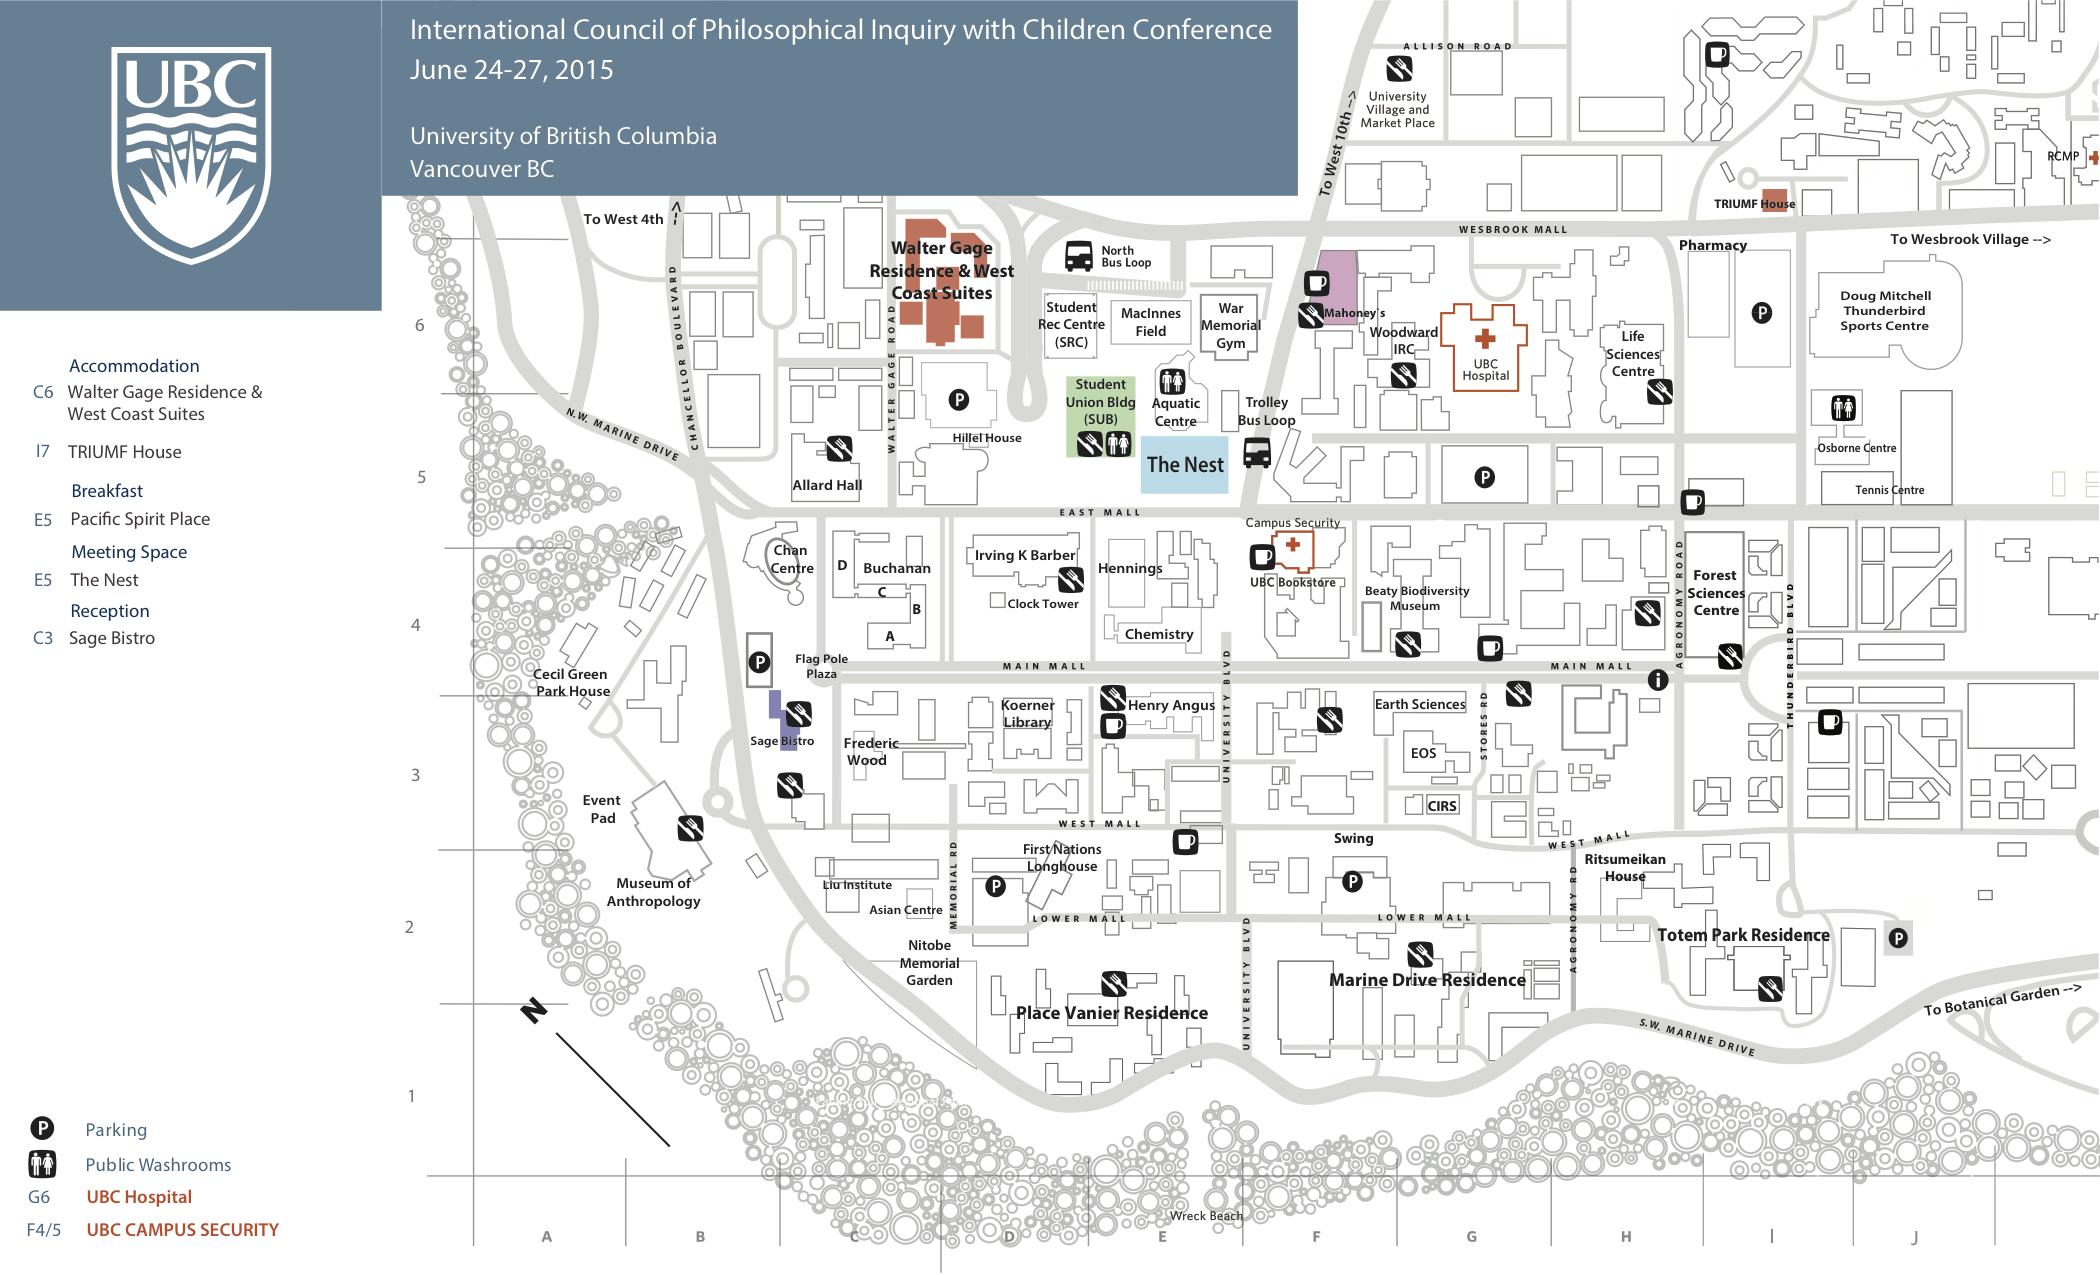 ICPIC MAP